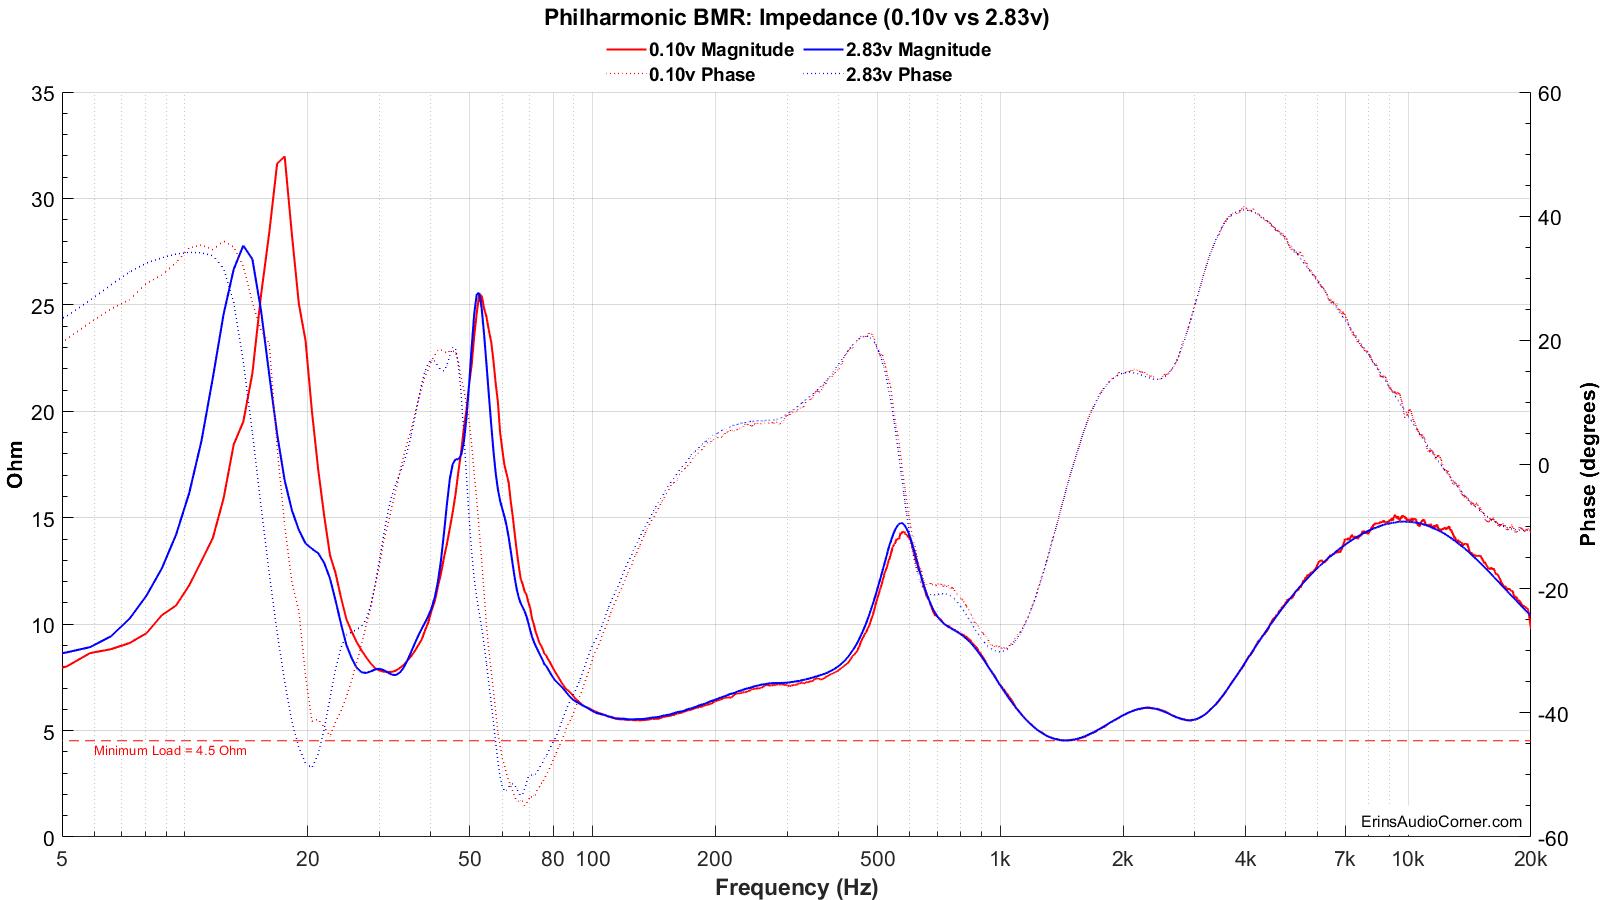 Philharmonic%20BMR_Impedance_0.1v_&_2.83v.png